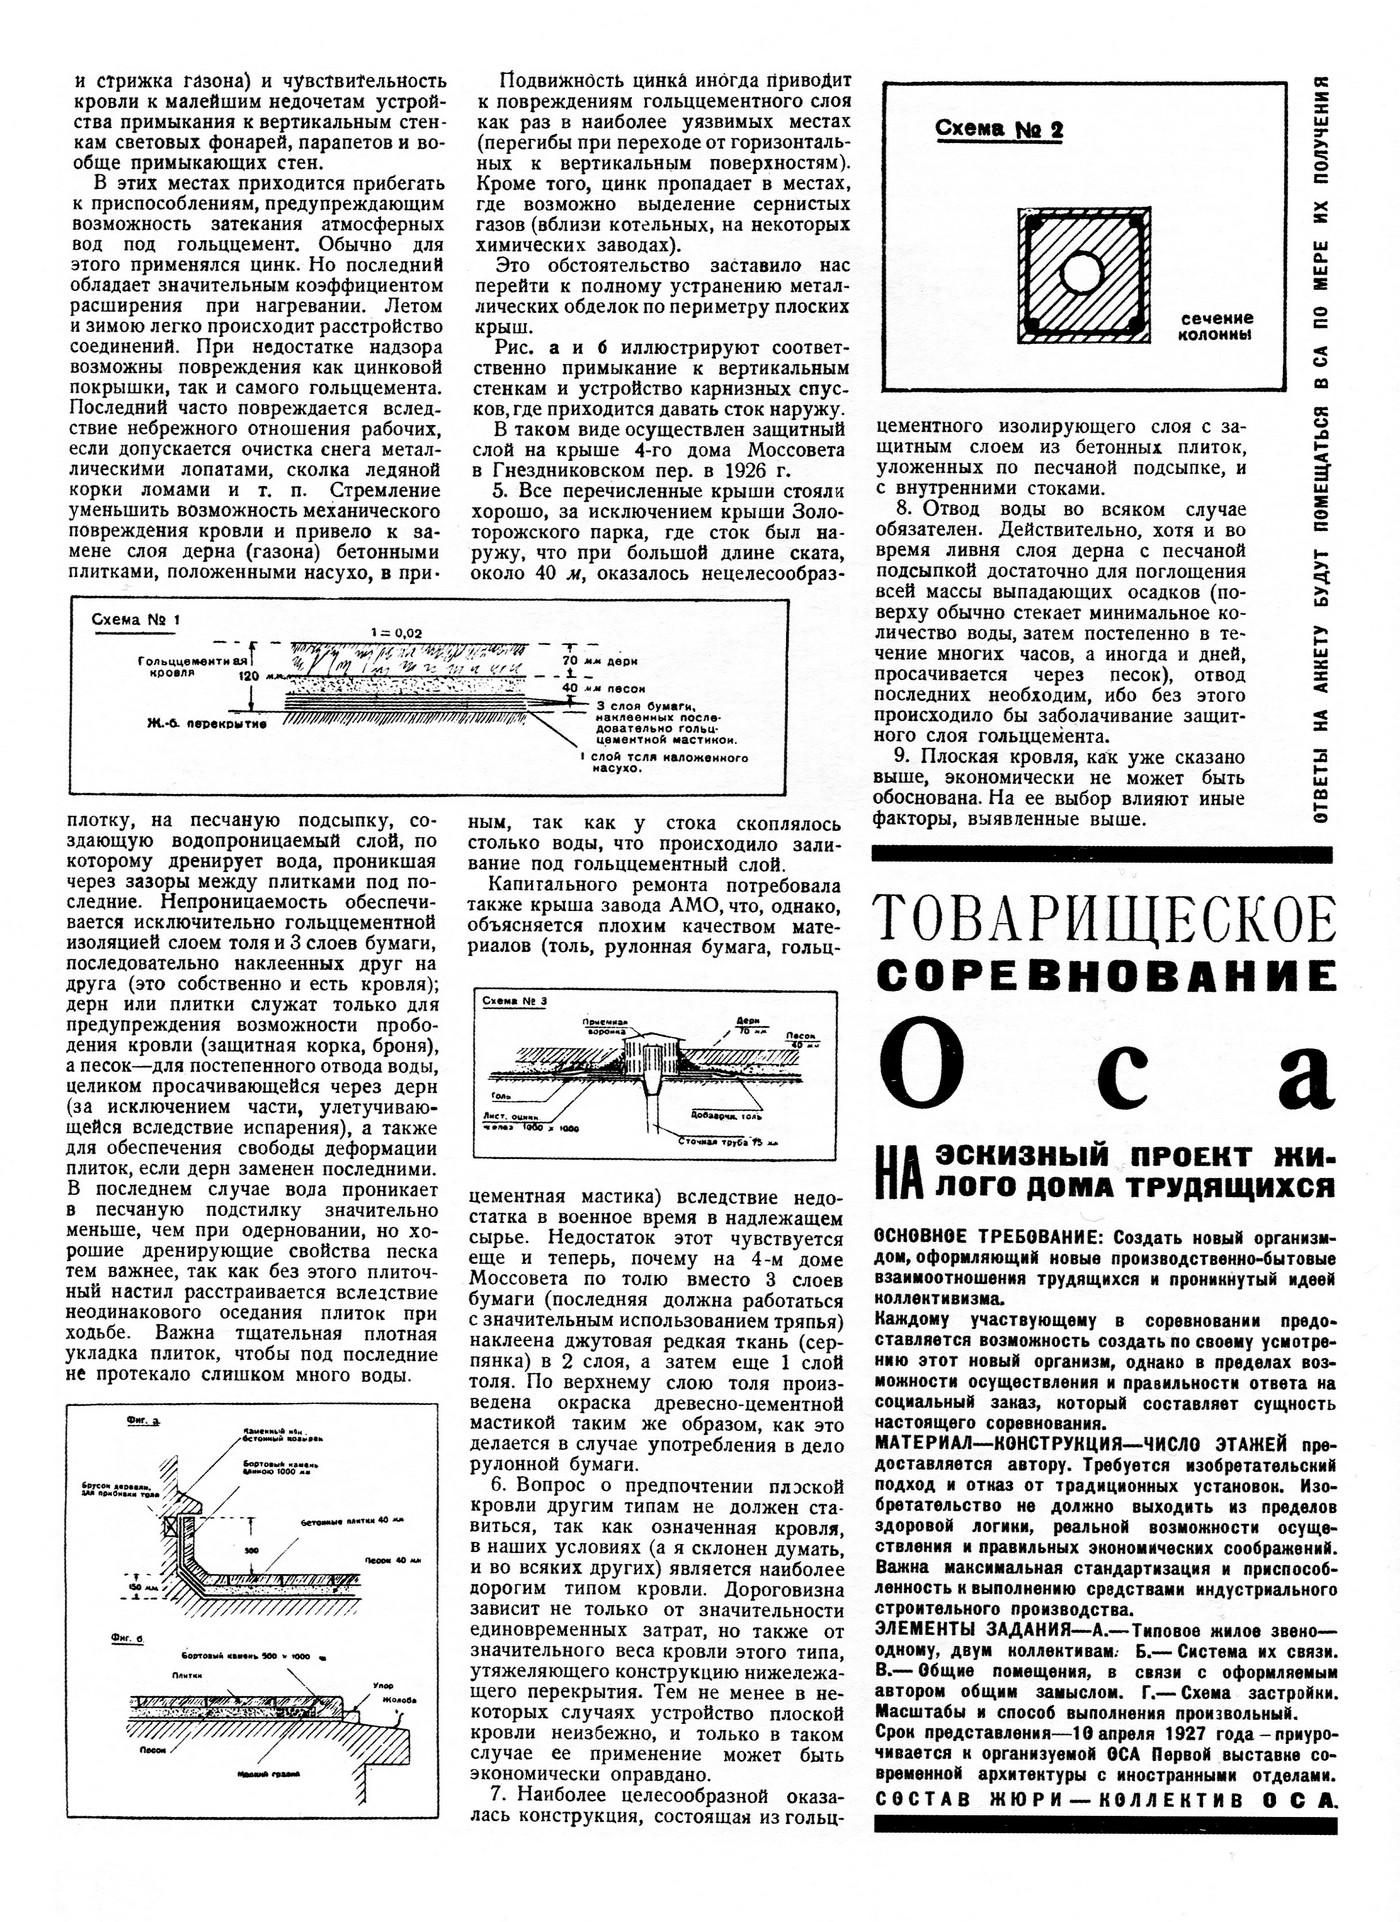 tehne.com-sa-1926-5-6-1400-0024